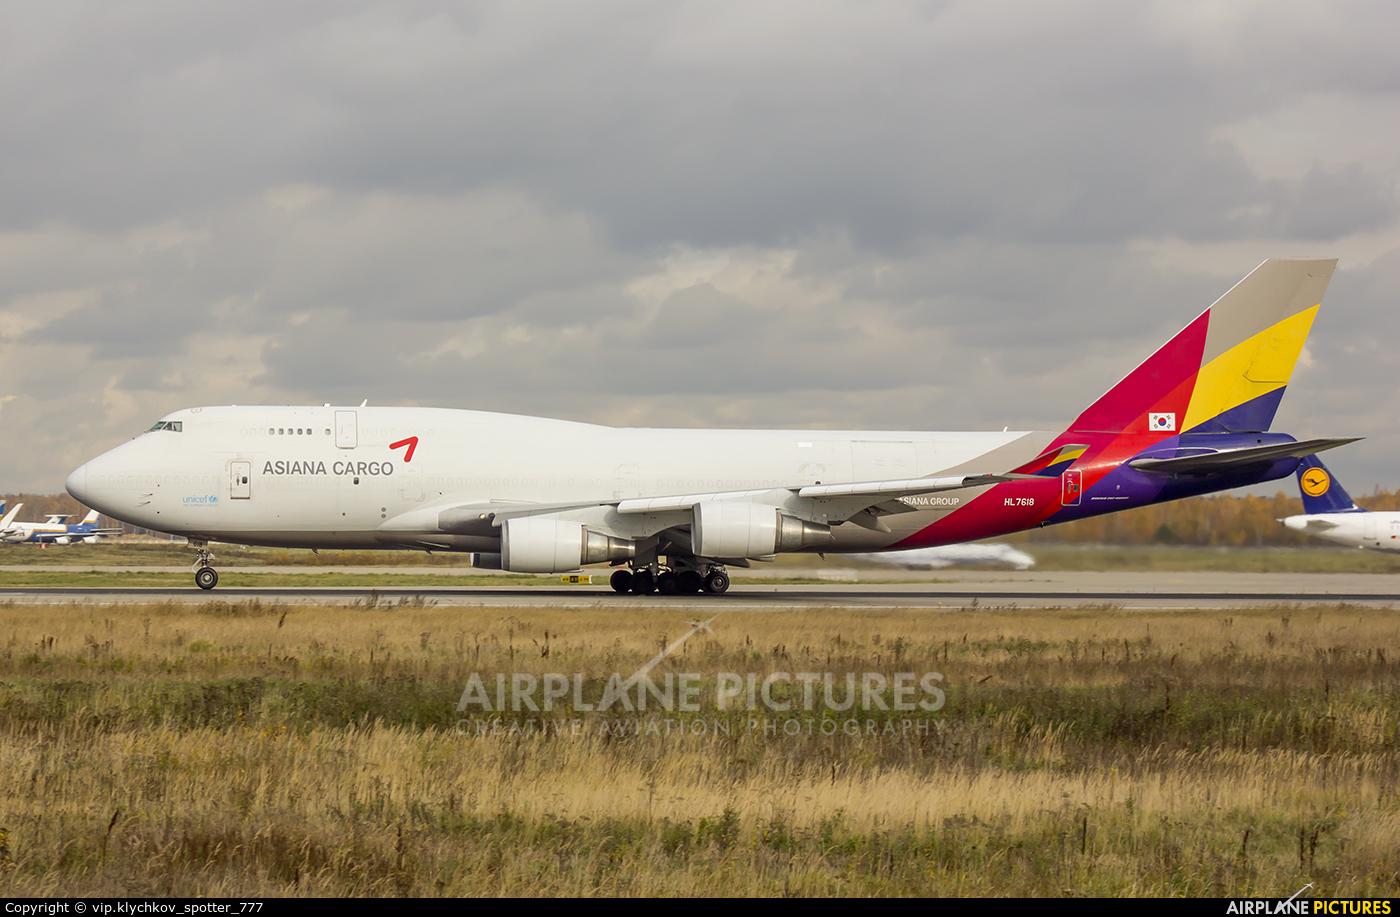 Asiana Cargo HL7618 aircraft at Moscow - Domodedovo